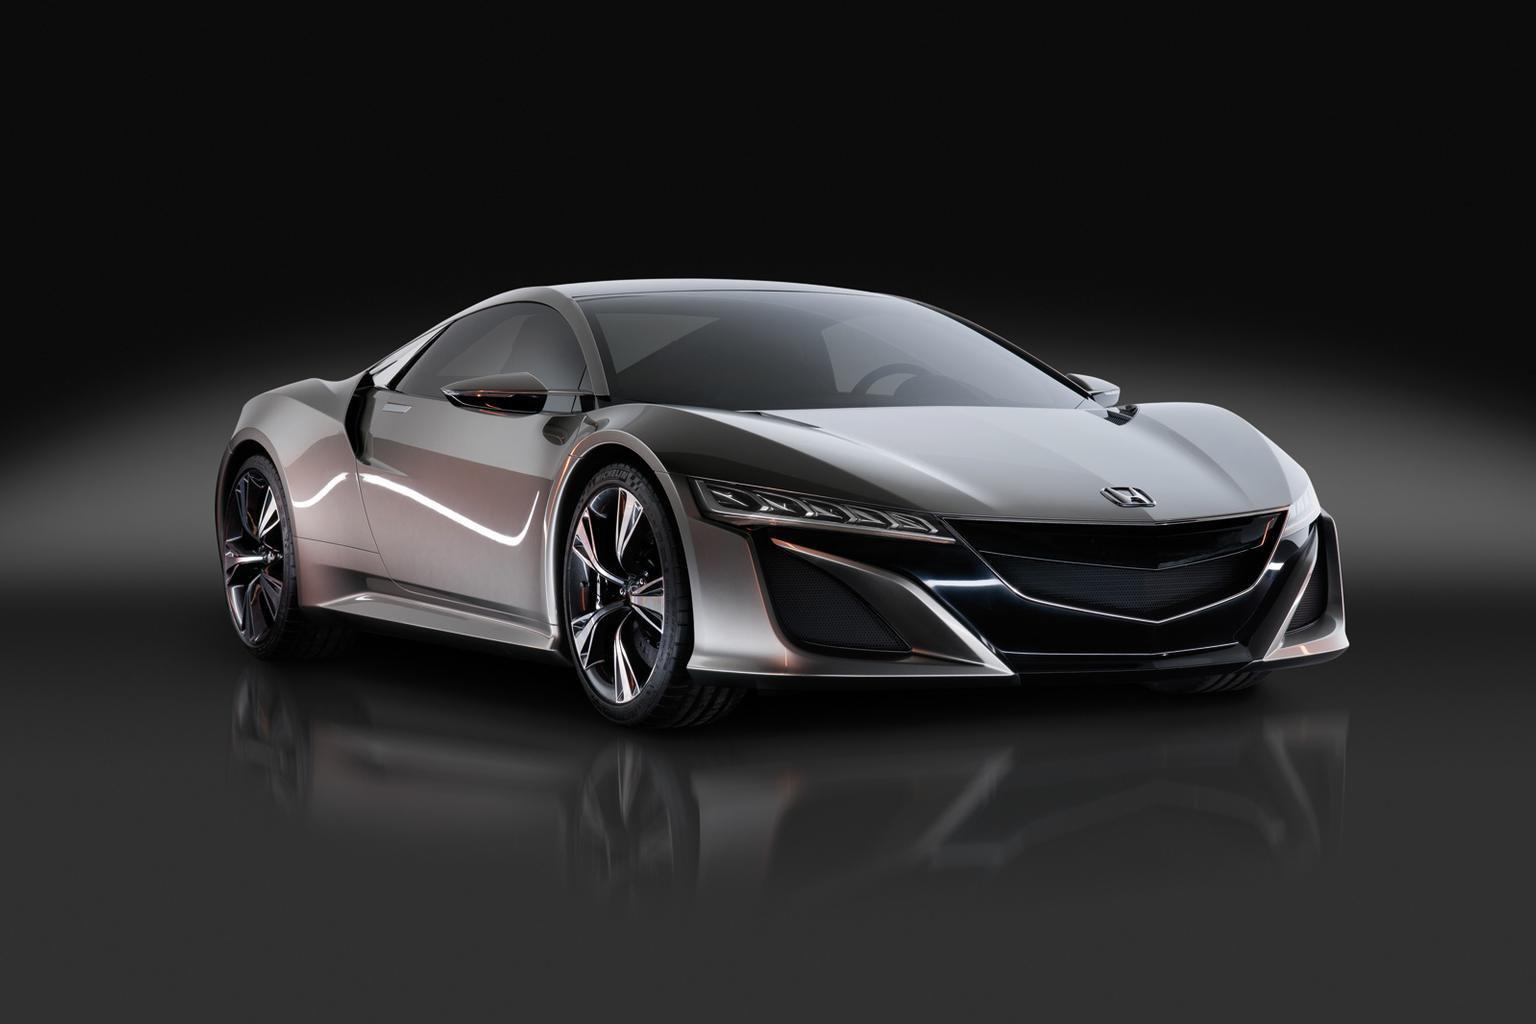 Production Honda NSX to debut at Goodwood